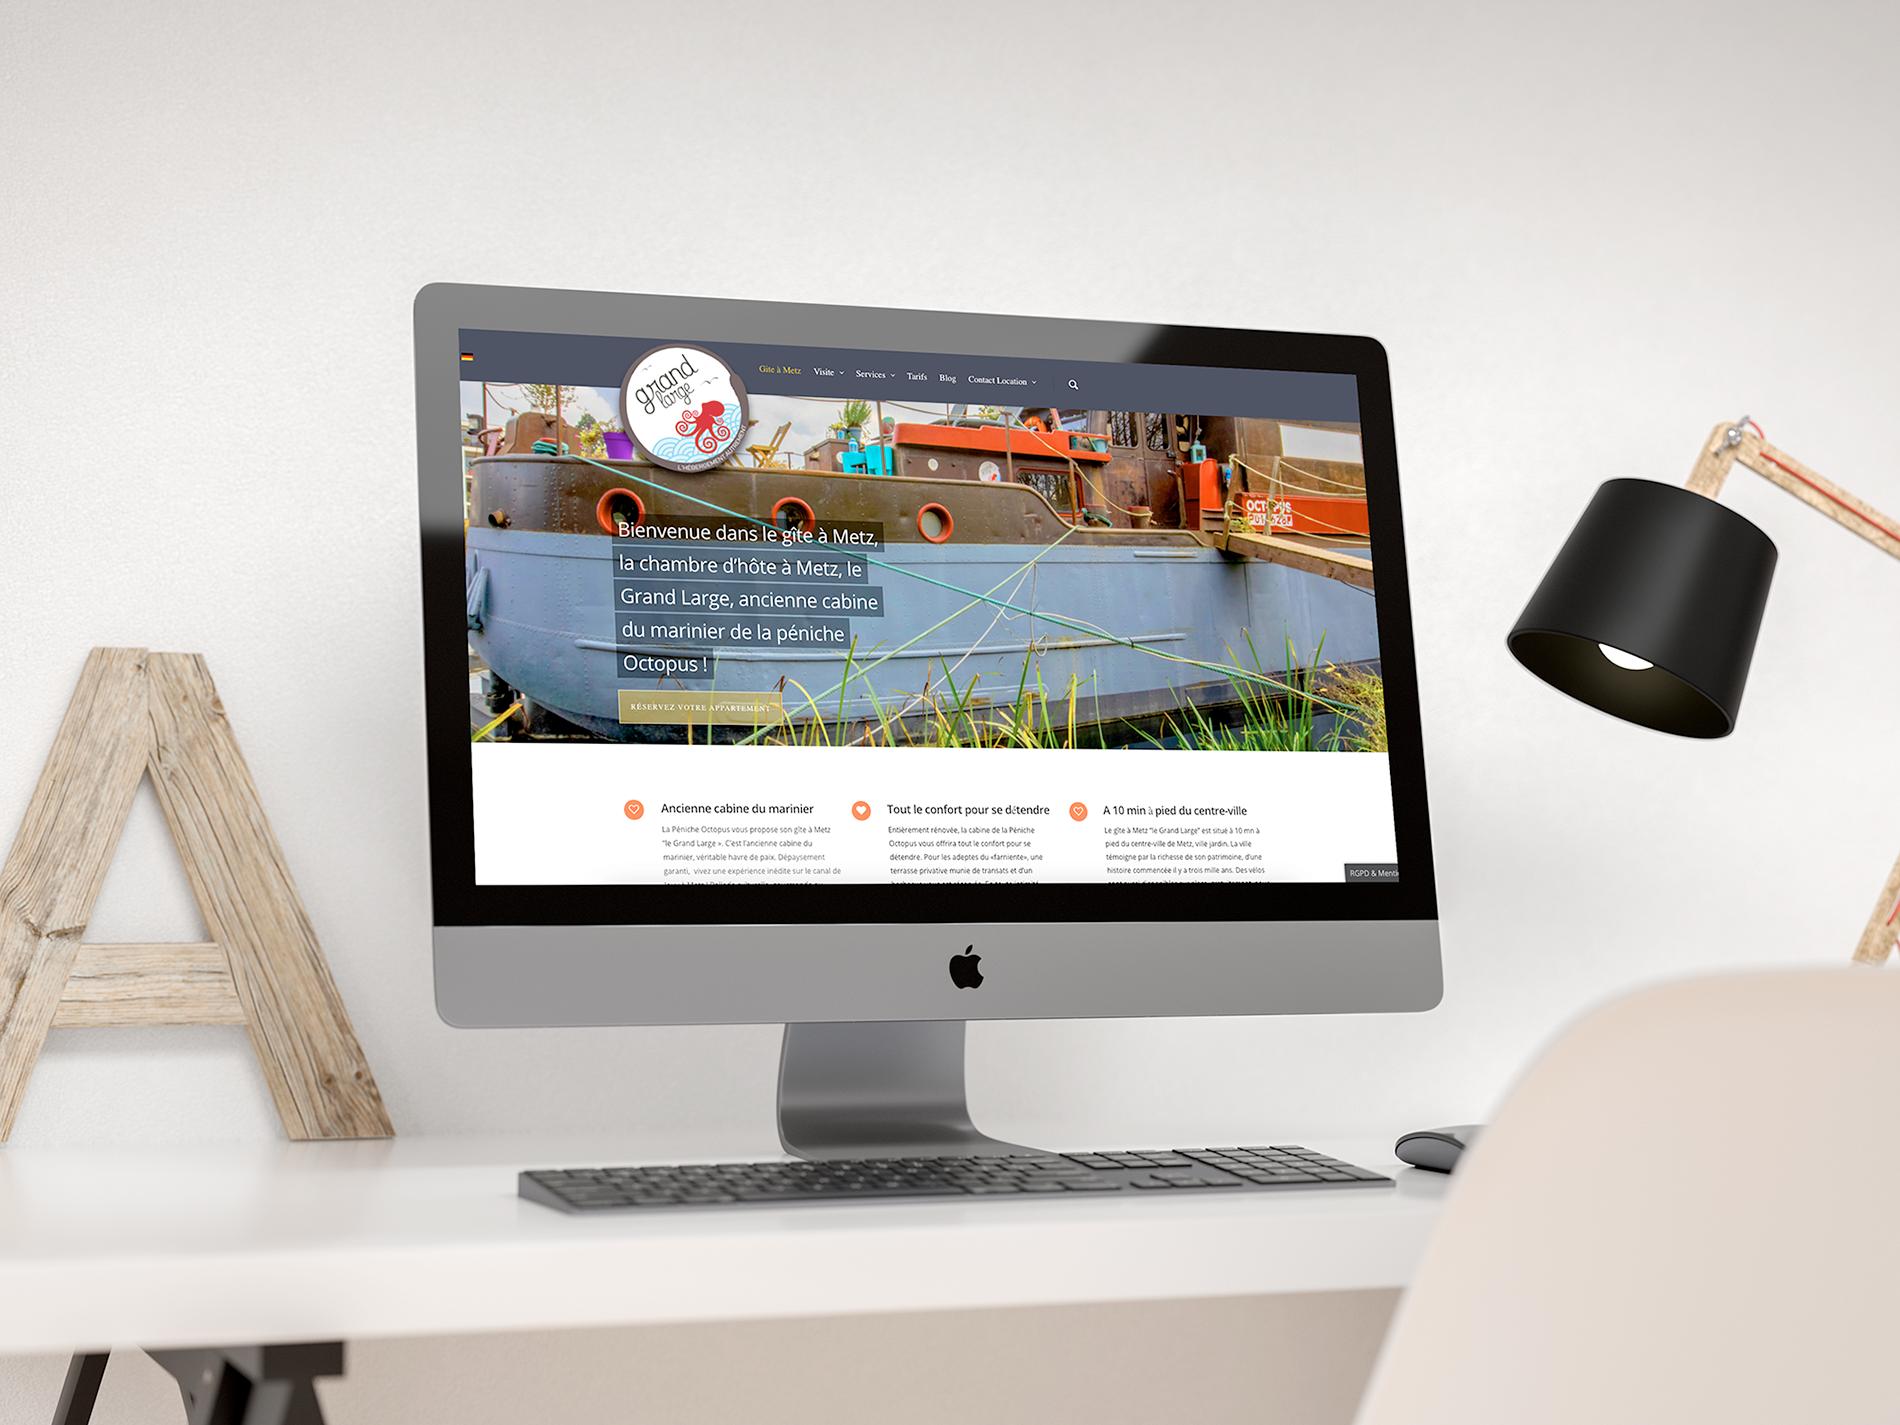 Création de site internet à Metz, agence digitale, agence seo